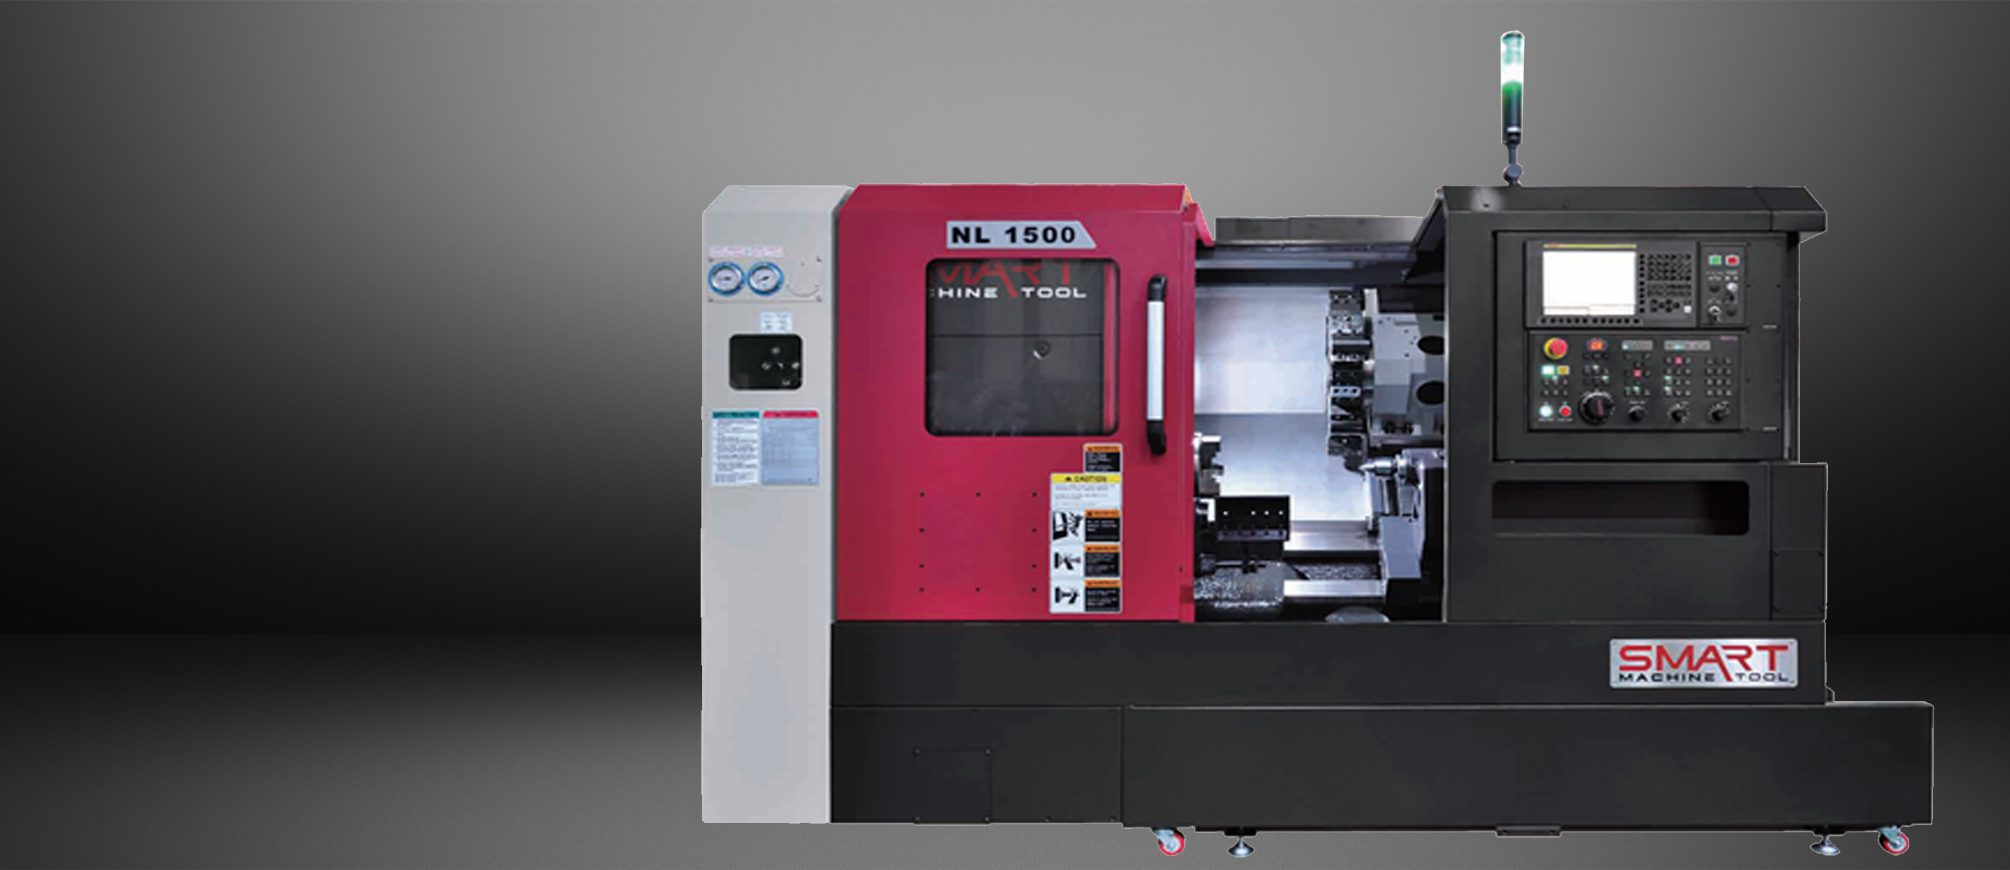 SMART NL 1500 – BOX WAY – (6″ CHUCK) 2-Axis CNC Lathes